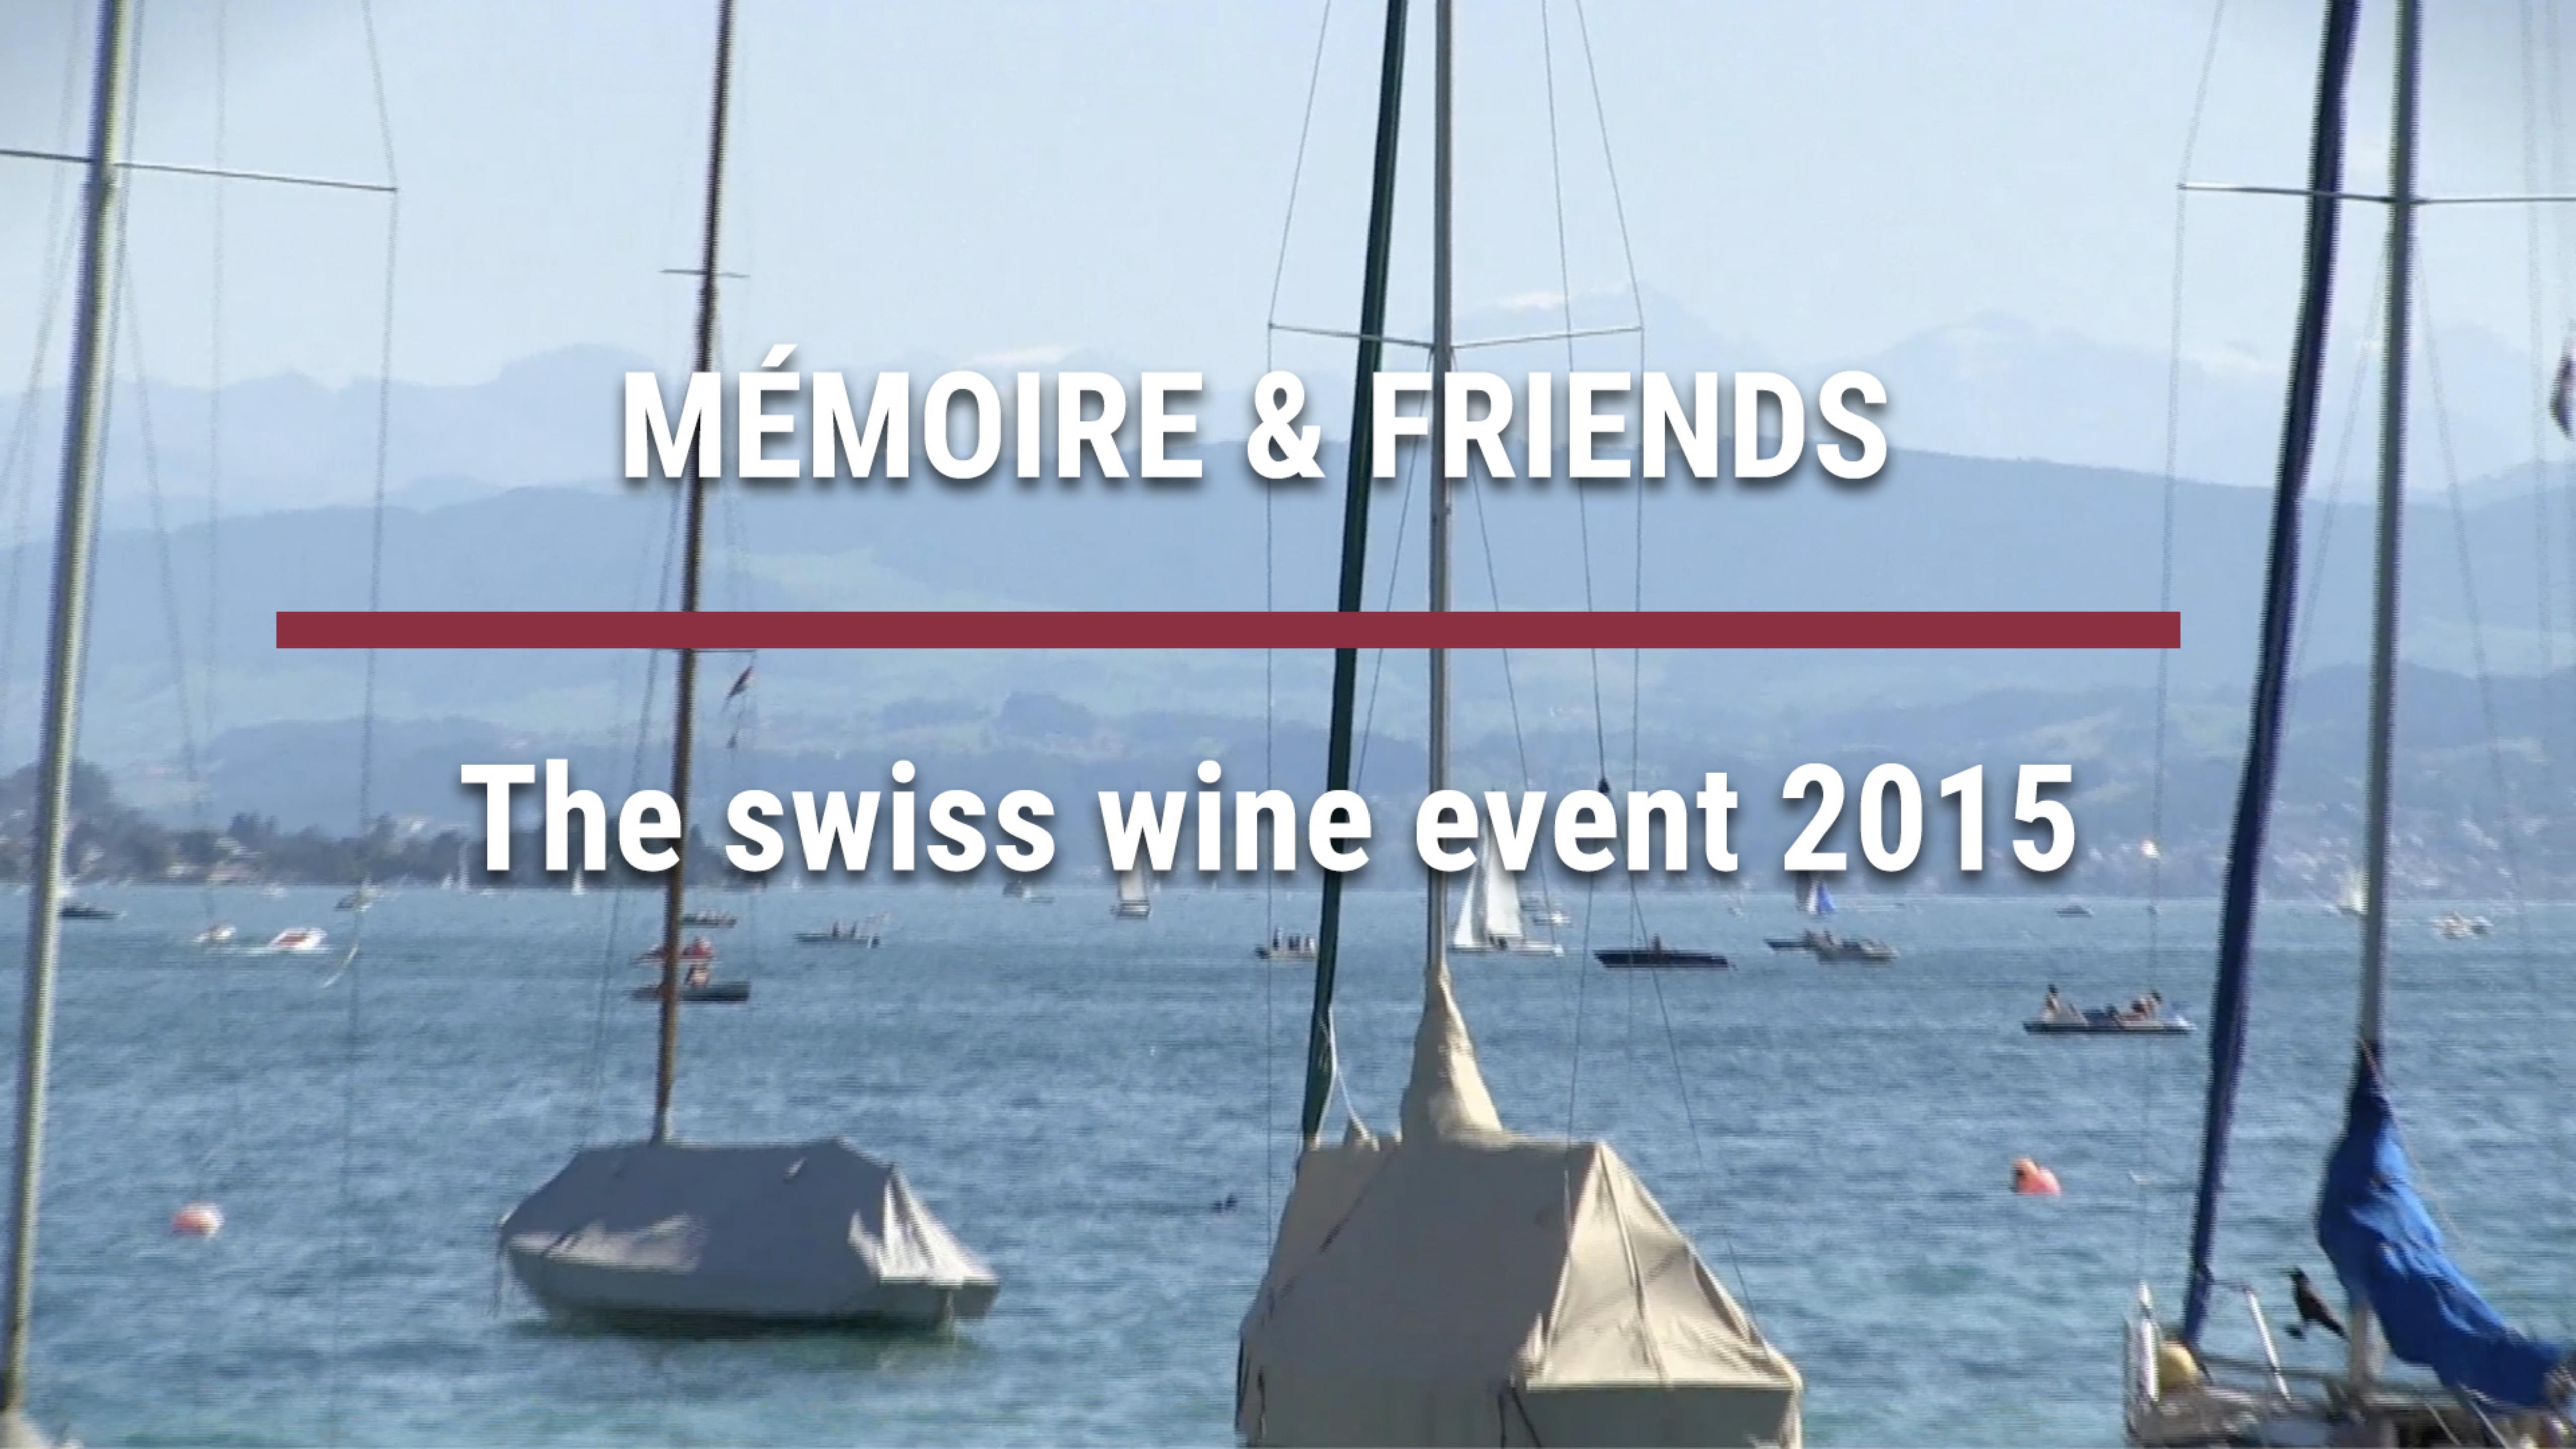 MÉMOIRE & FRIENDS – The swiss wine event 2015